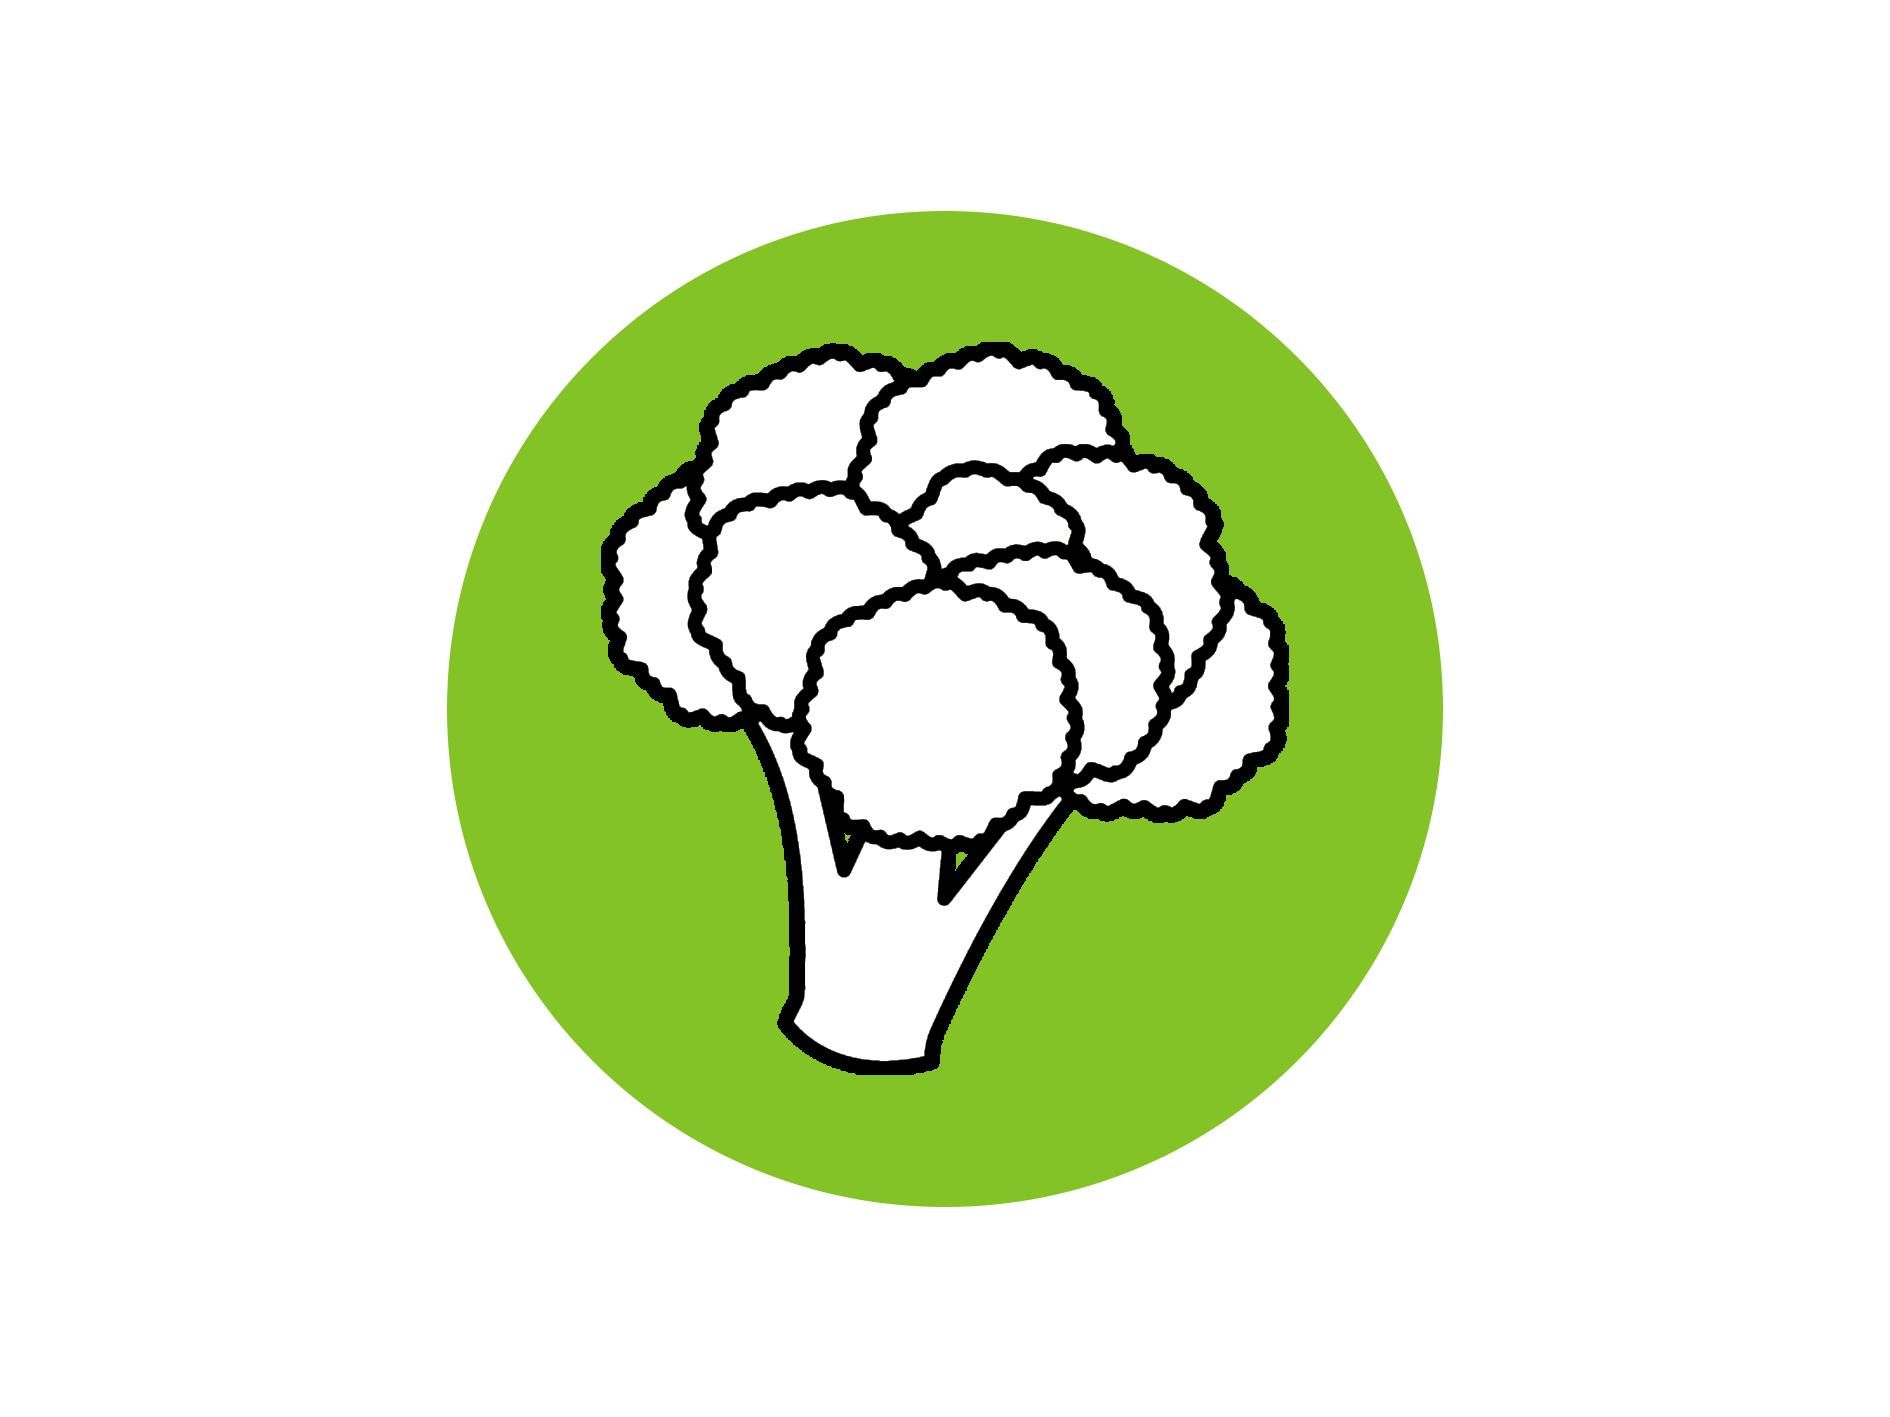 The Palto Broccoli Clipart.png